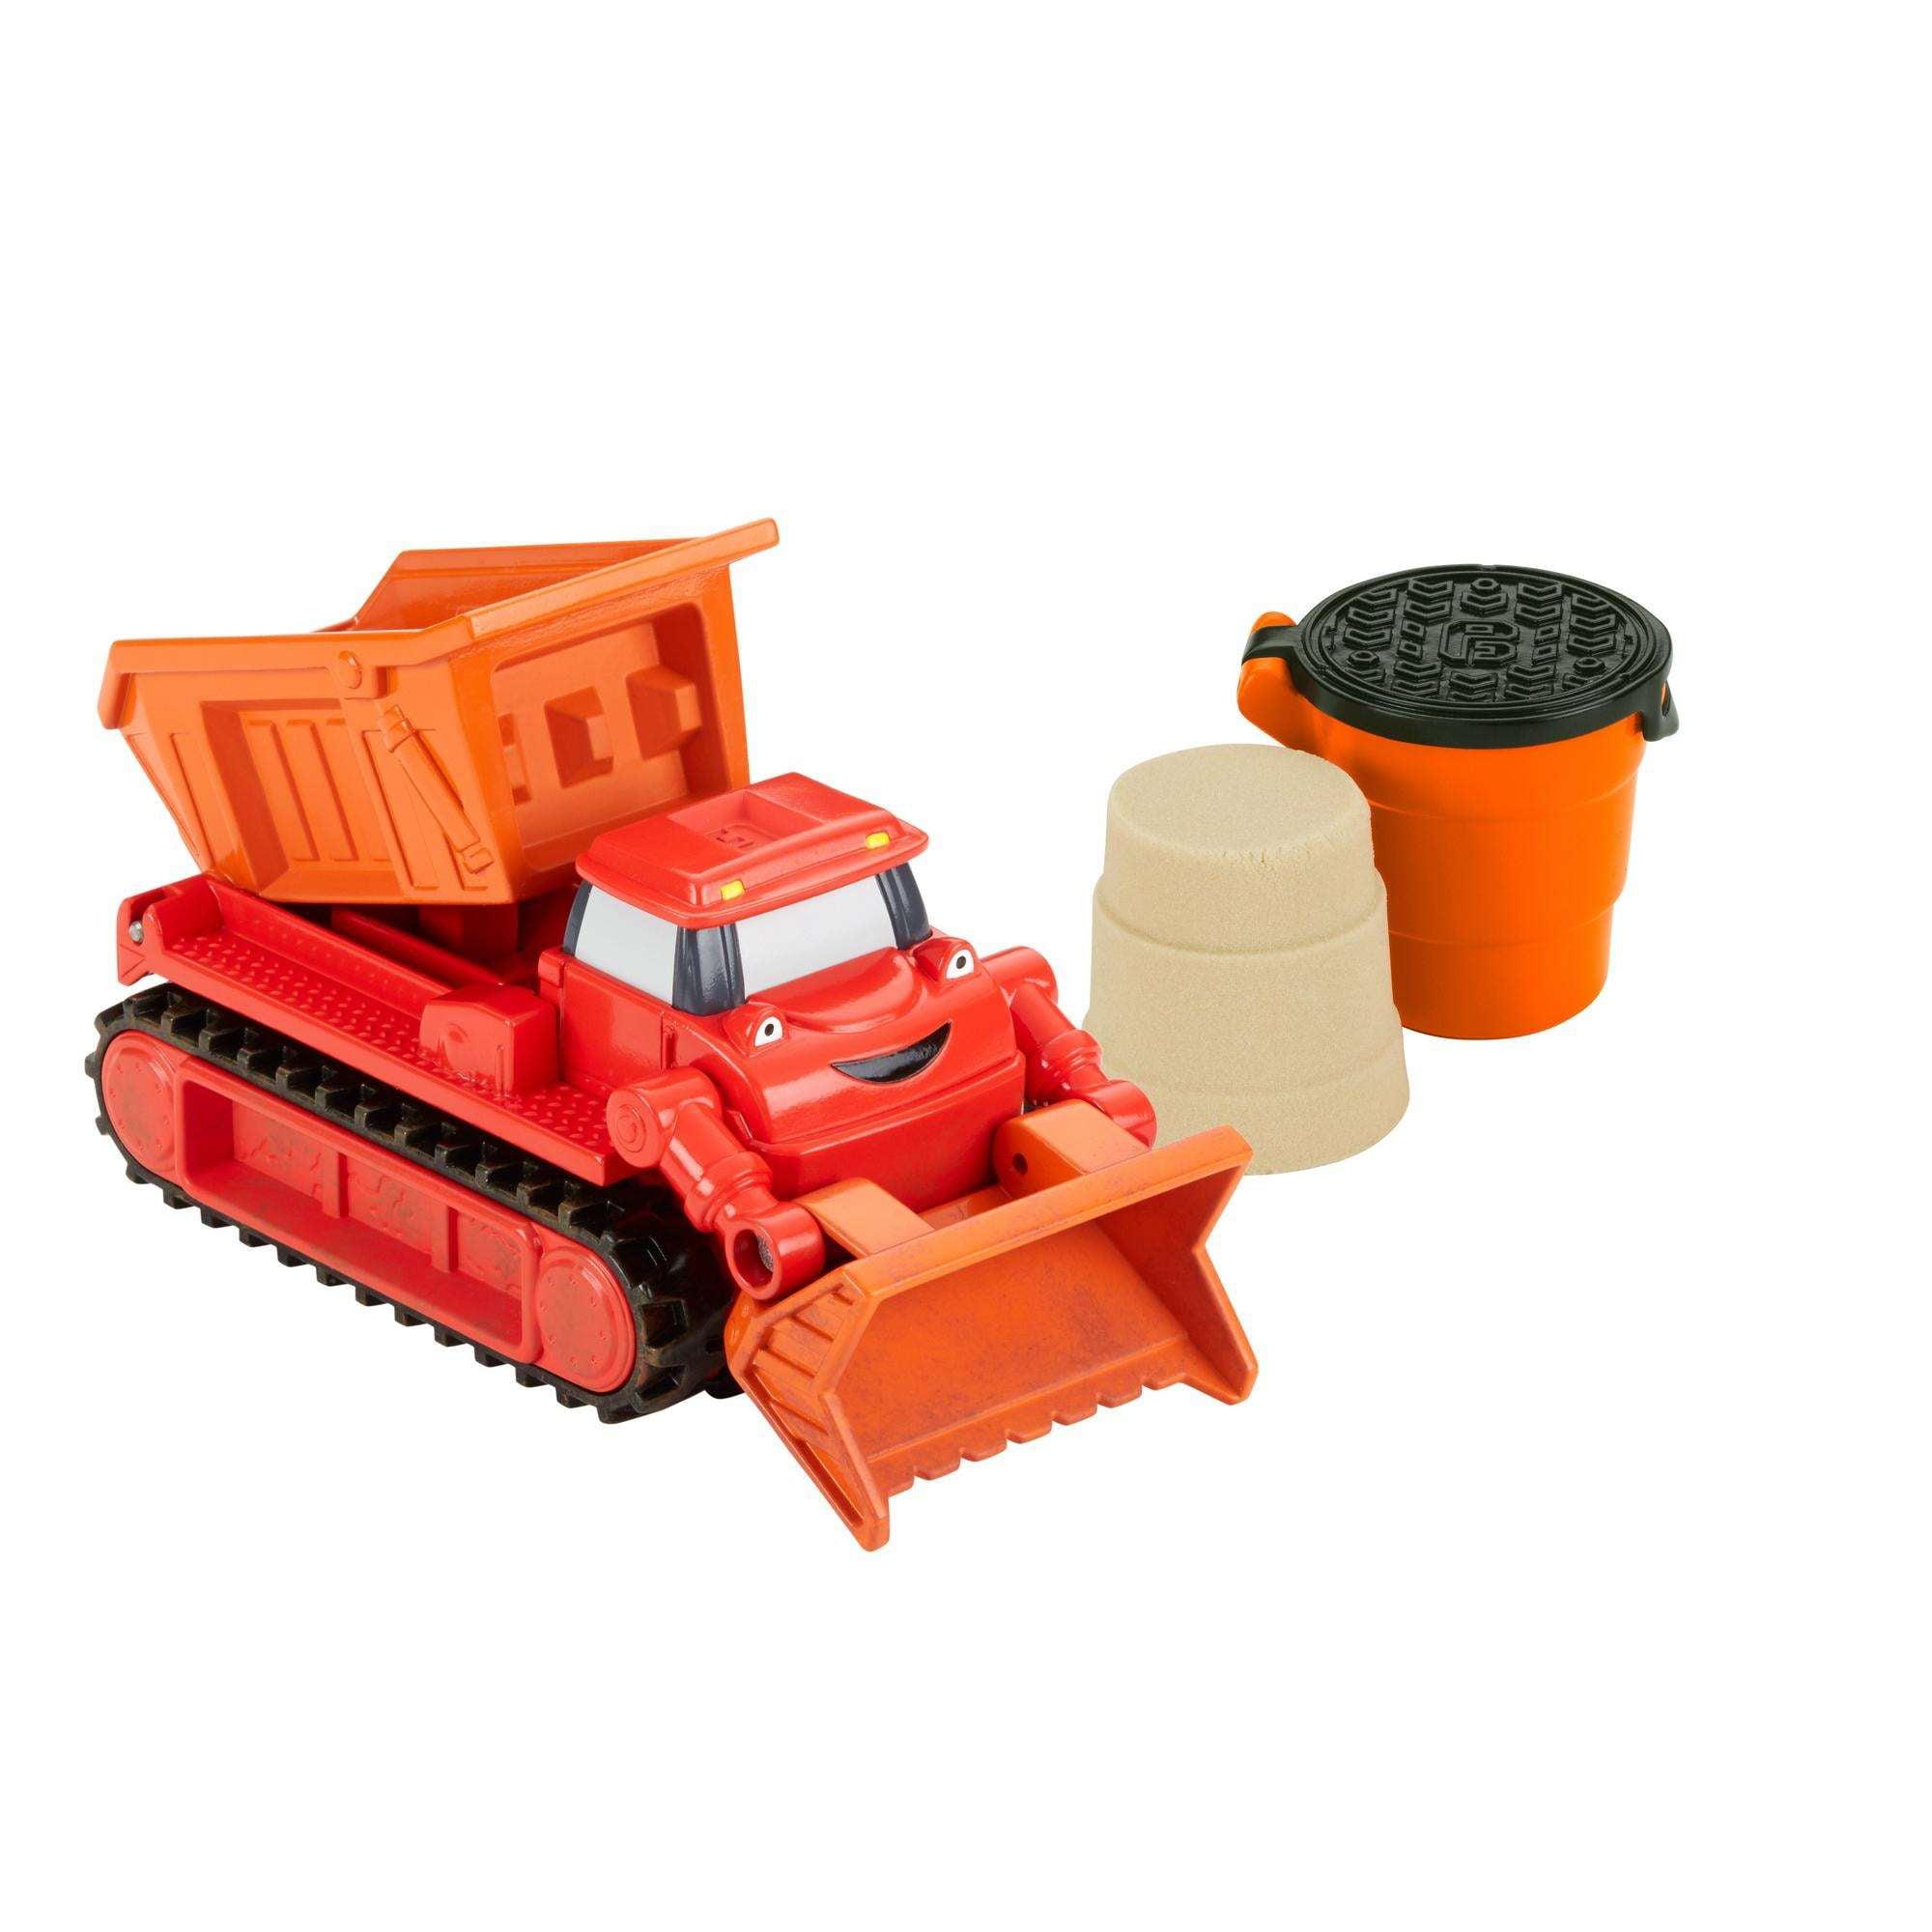 Bob the Builder Muck Sand Vehicle